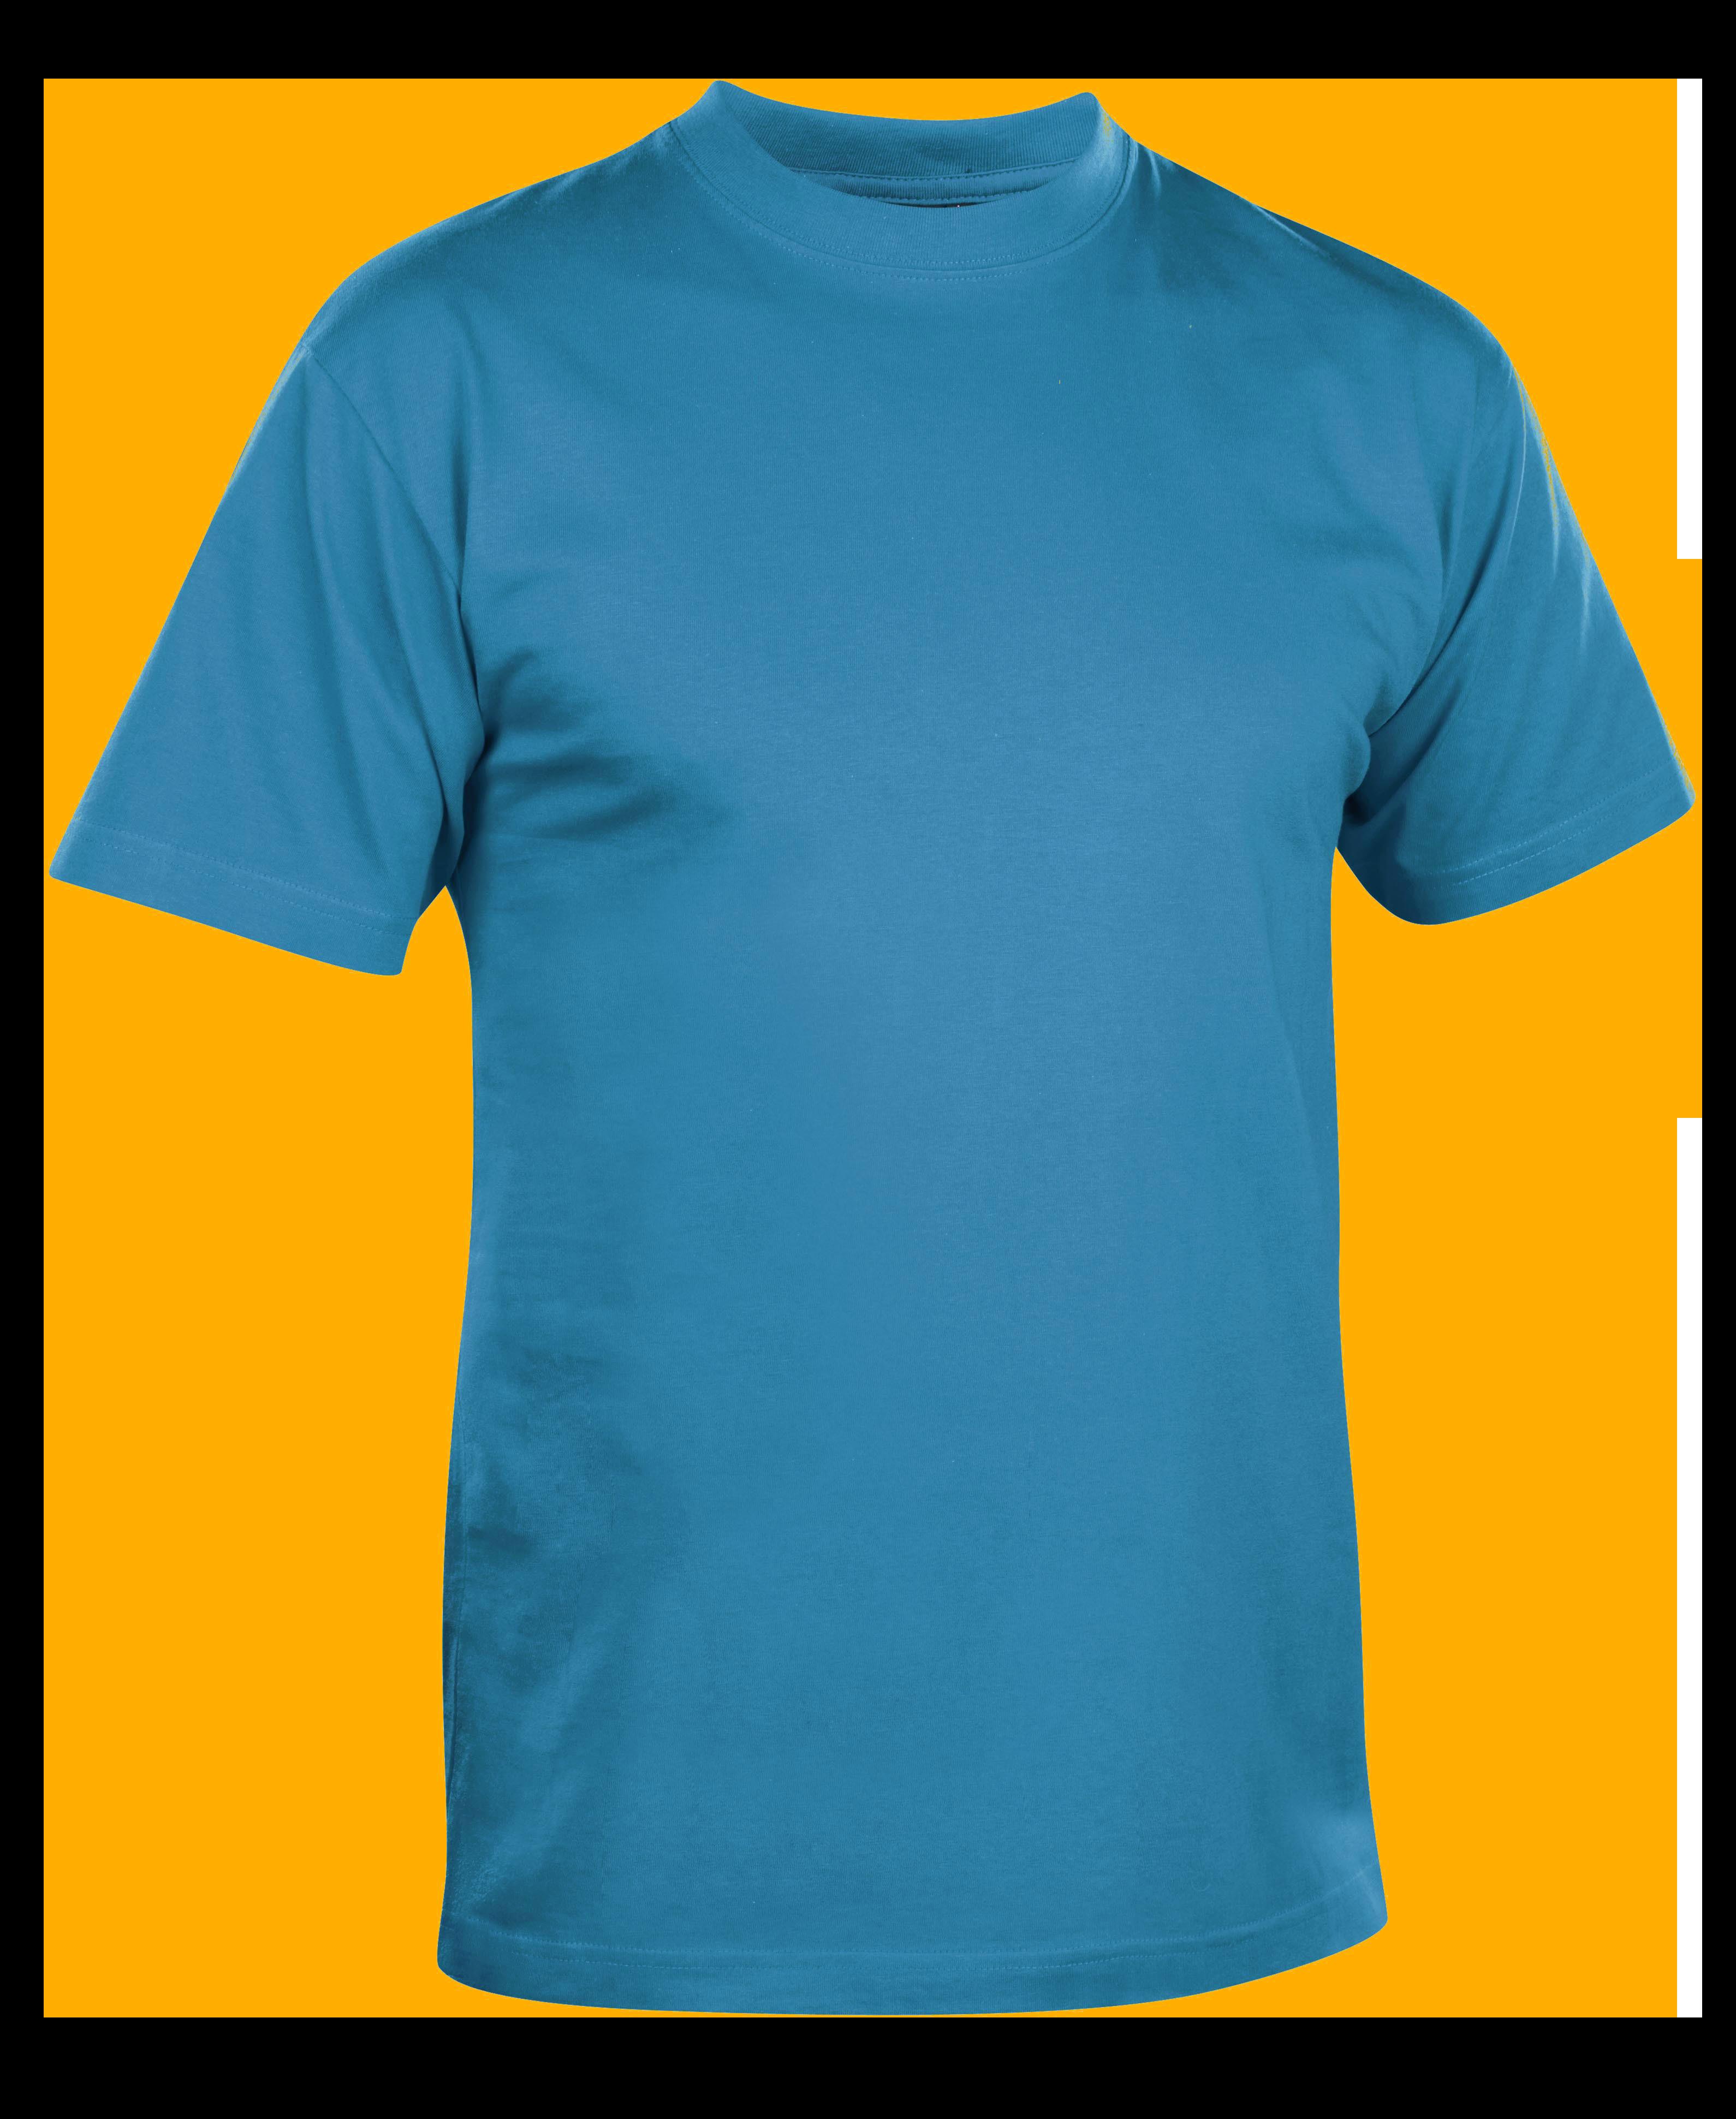 Sky Blue T-Shirt PNG Image - PurePNG | Free transparent ...